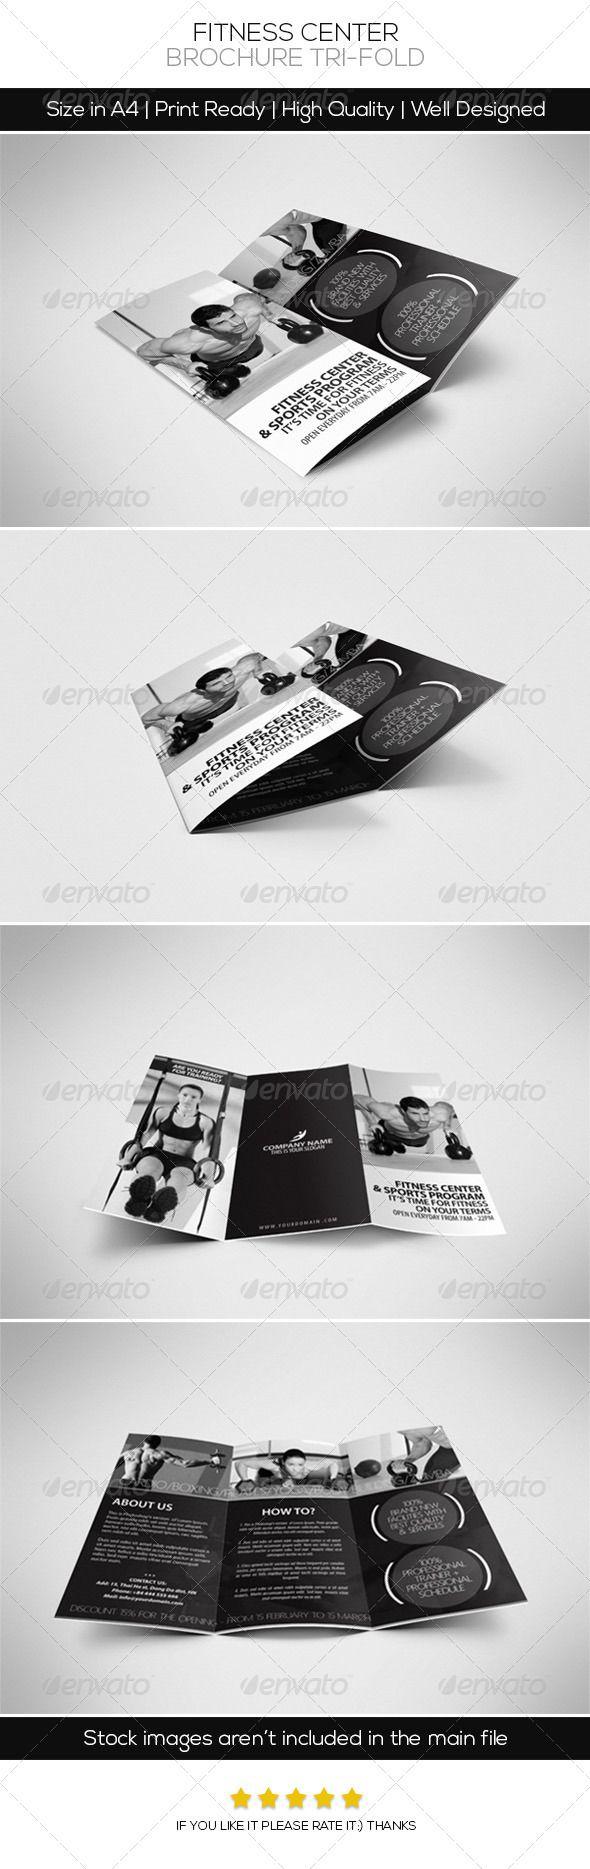 Fitness Center Brochure Tri Fold